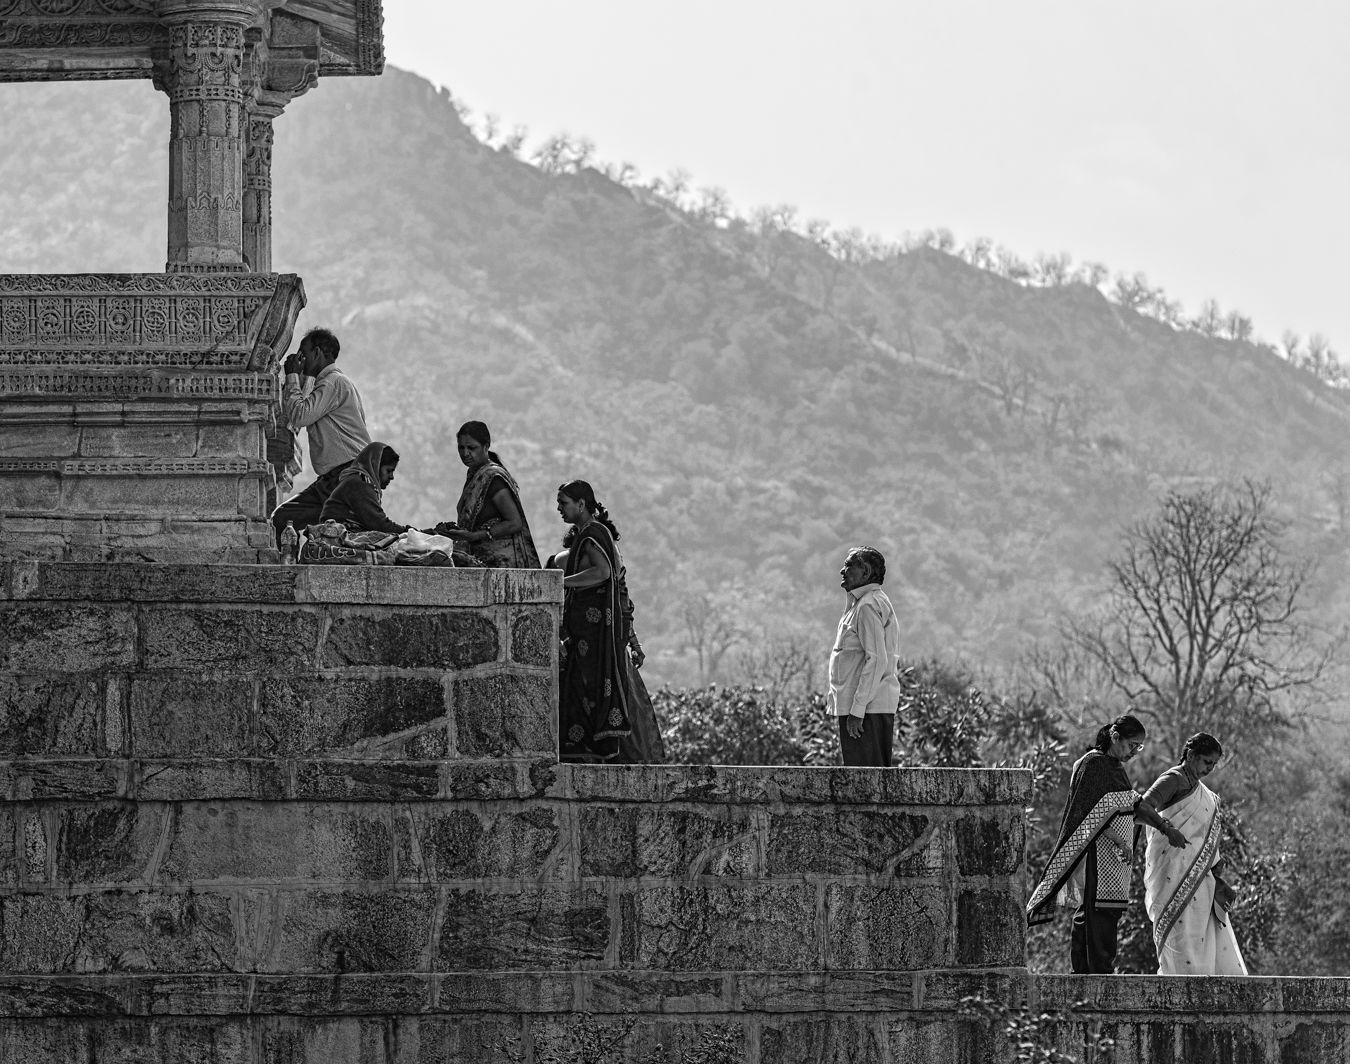 Ranakpur Jain Temple, Rajasthan, January 2016